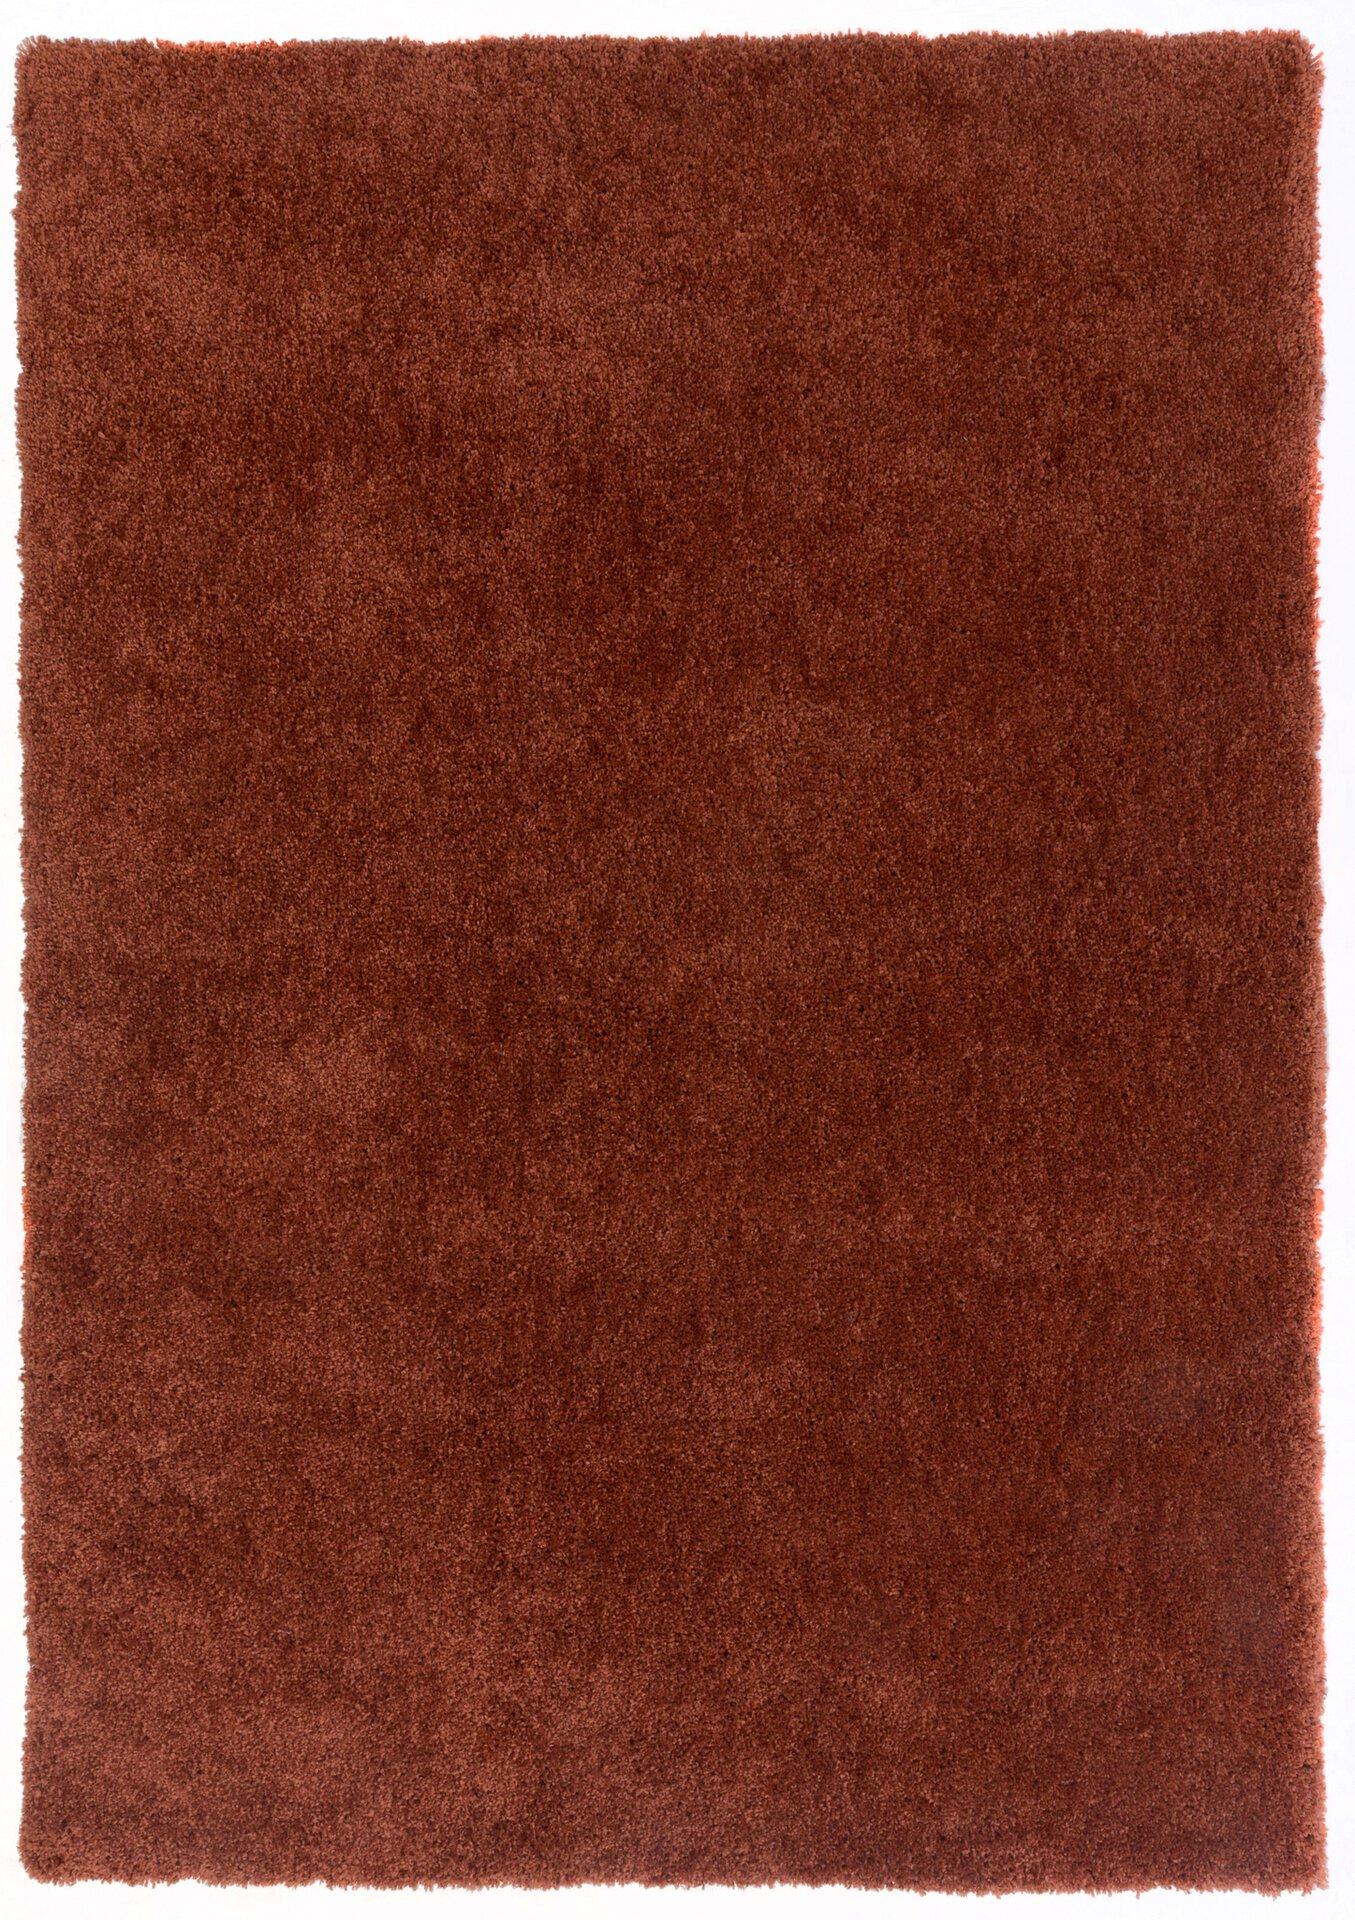 Handtuftteppich Giulia Gino Falcone Textil braun 160 x 230 cm